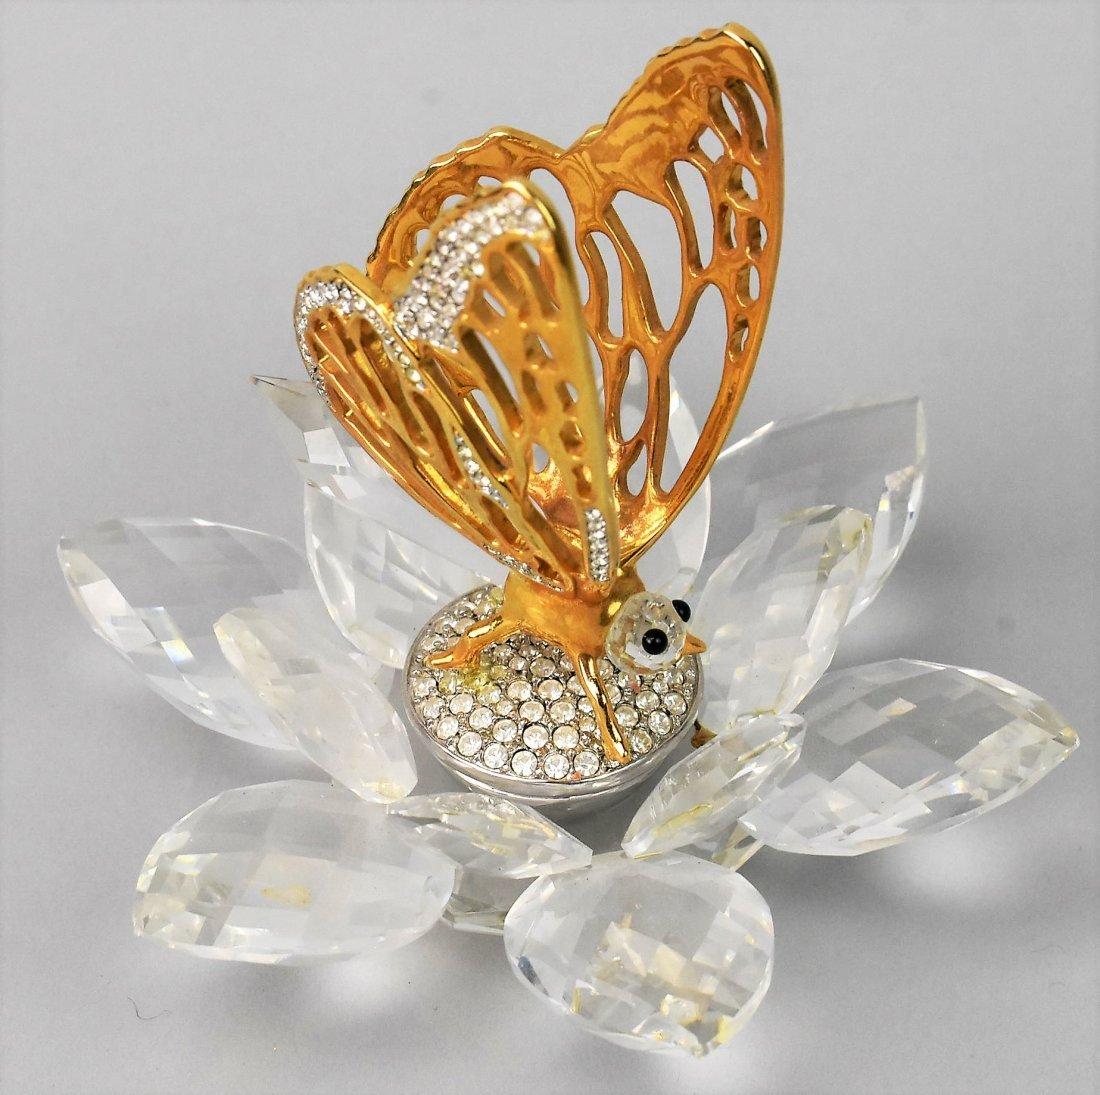 Swarovski Crystal Butteryfly In Flight - 6